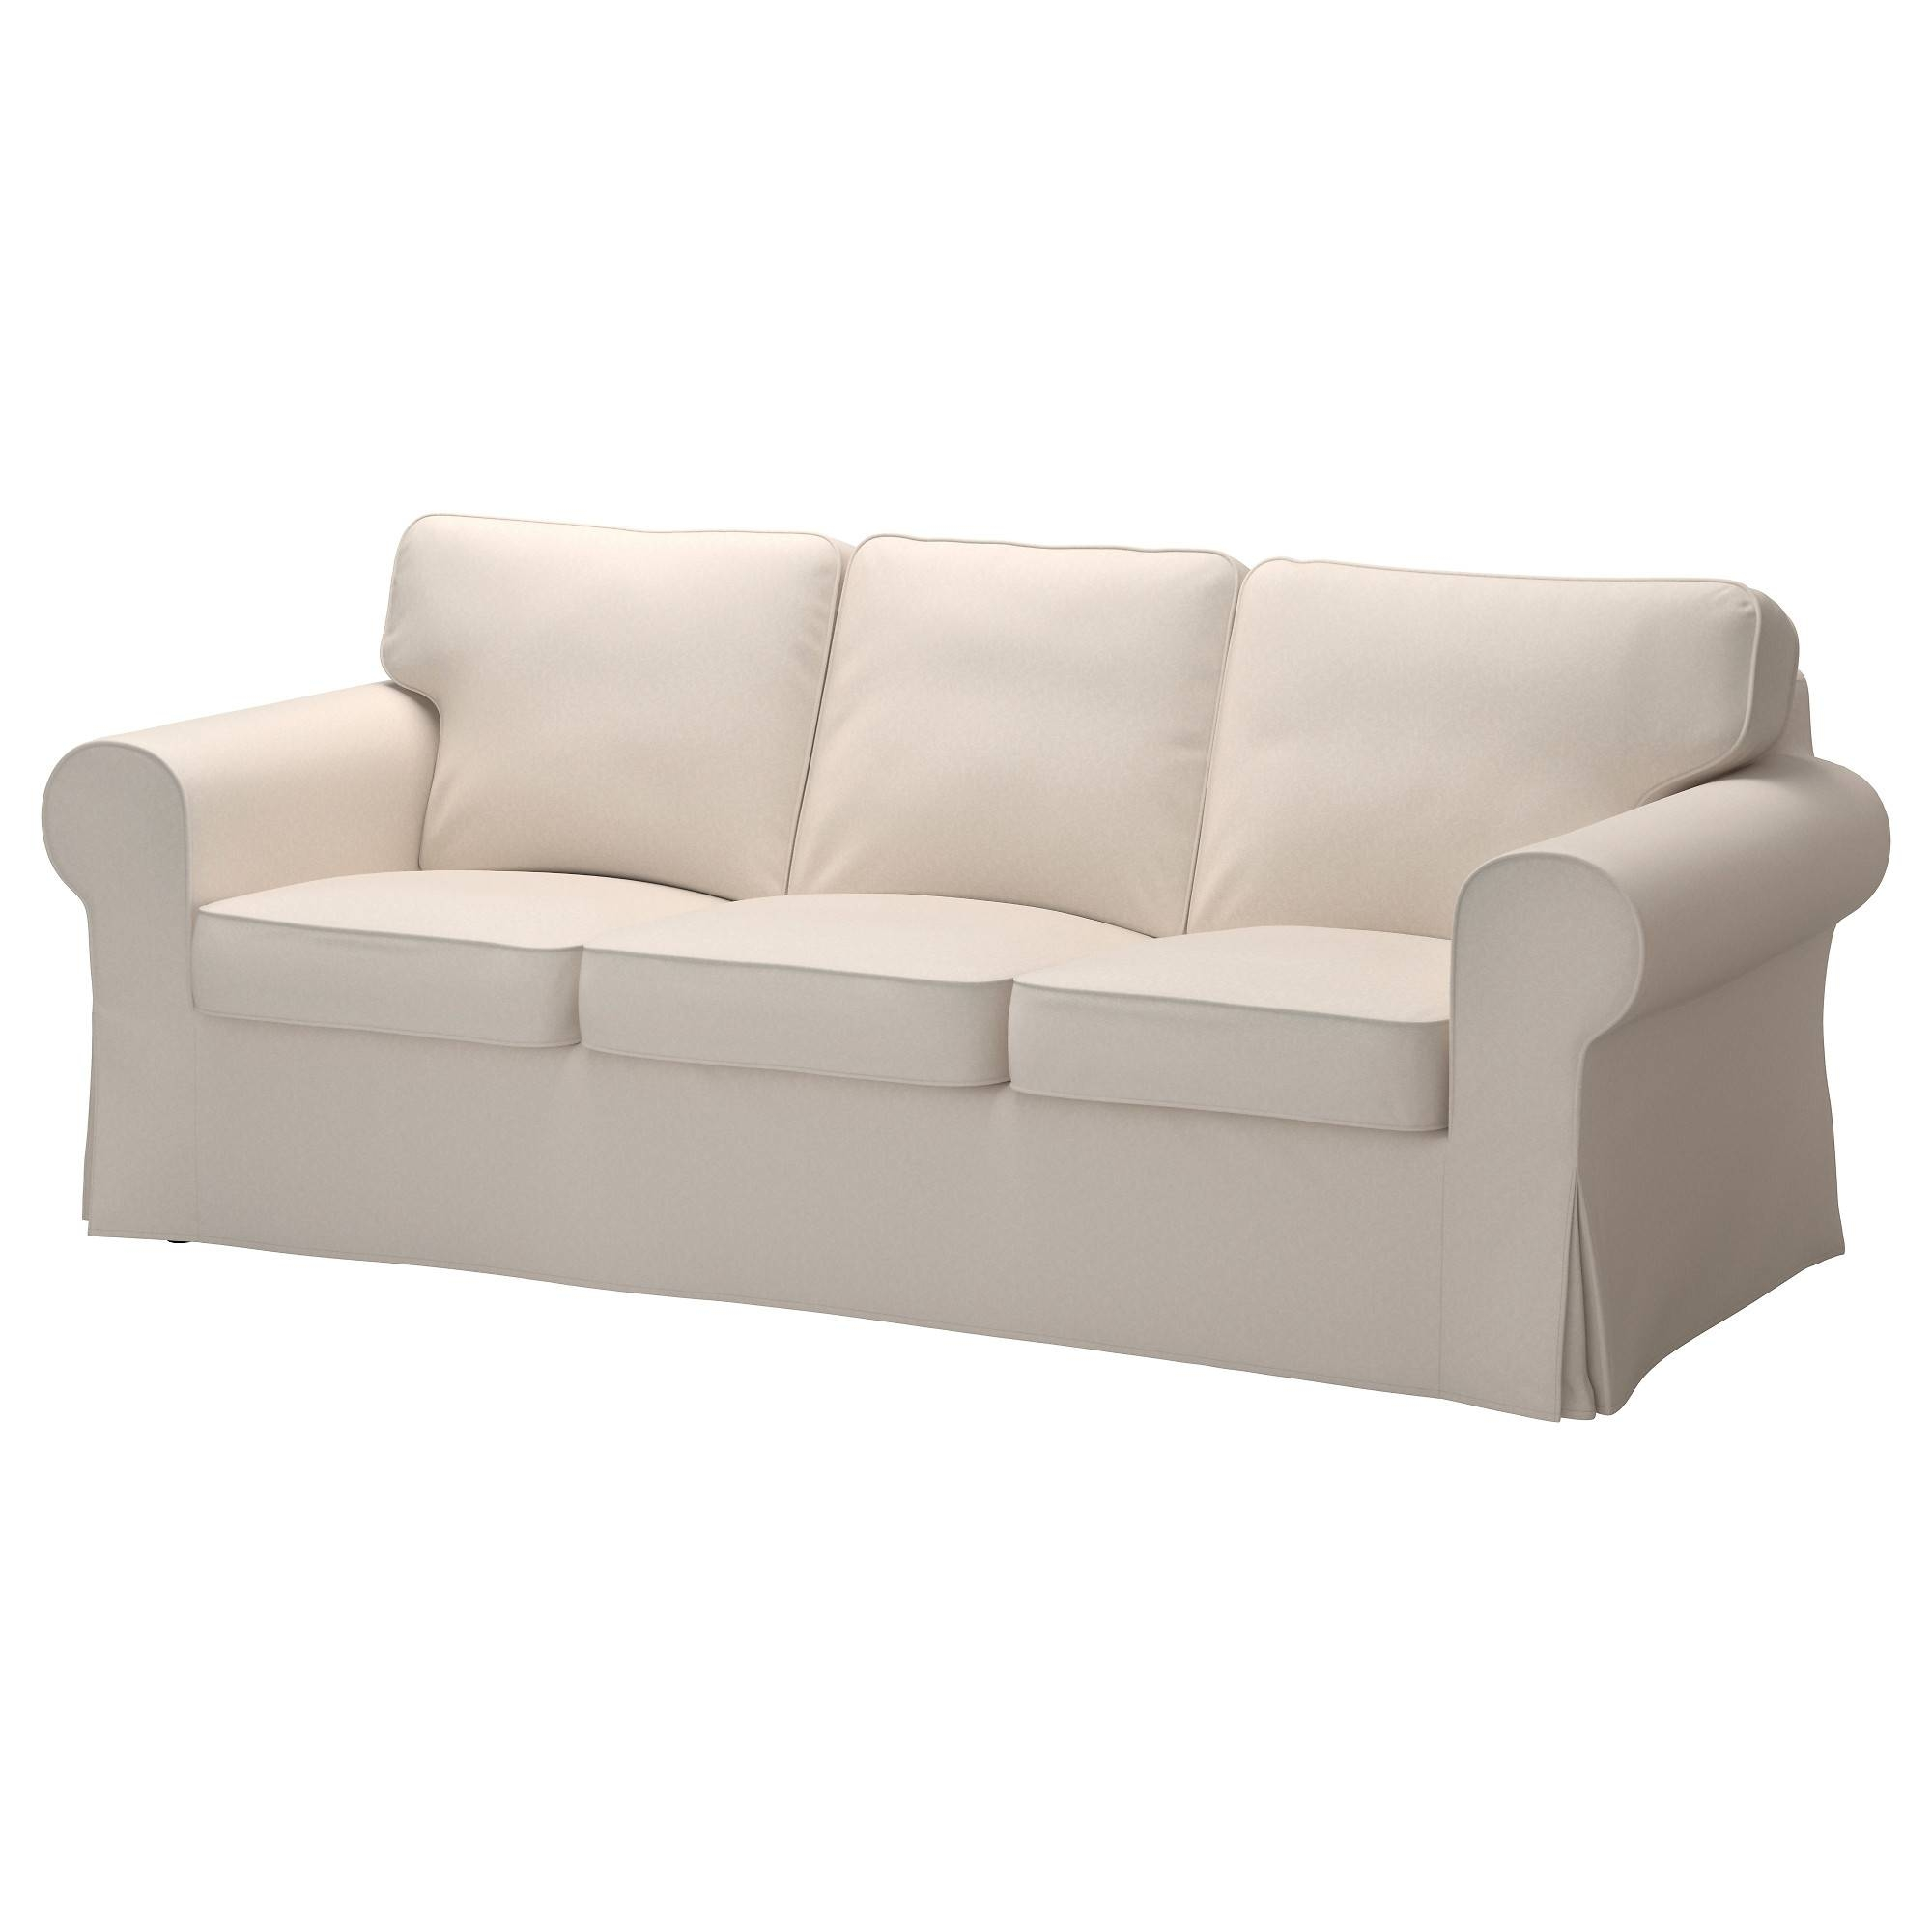 Fabric Sofas - Modern & Contemporary - Ikea throughout Mid Range Sofas (Image 11 of 30)